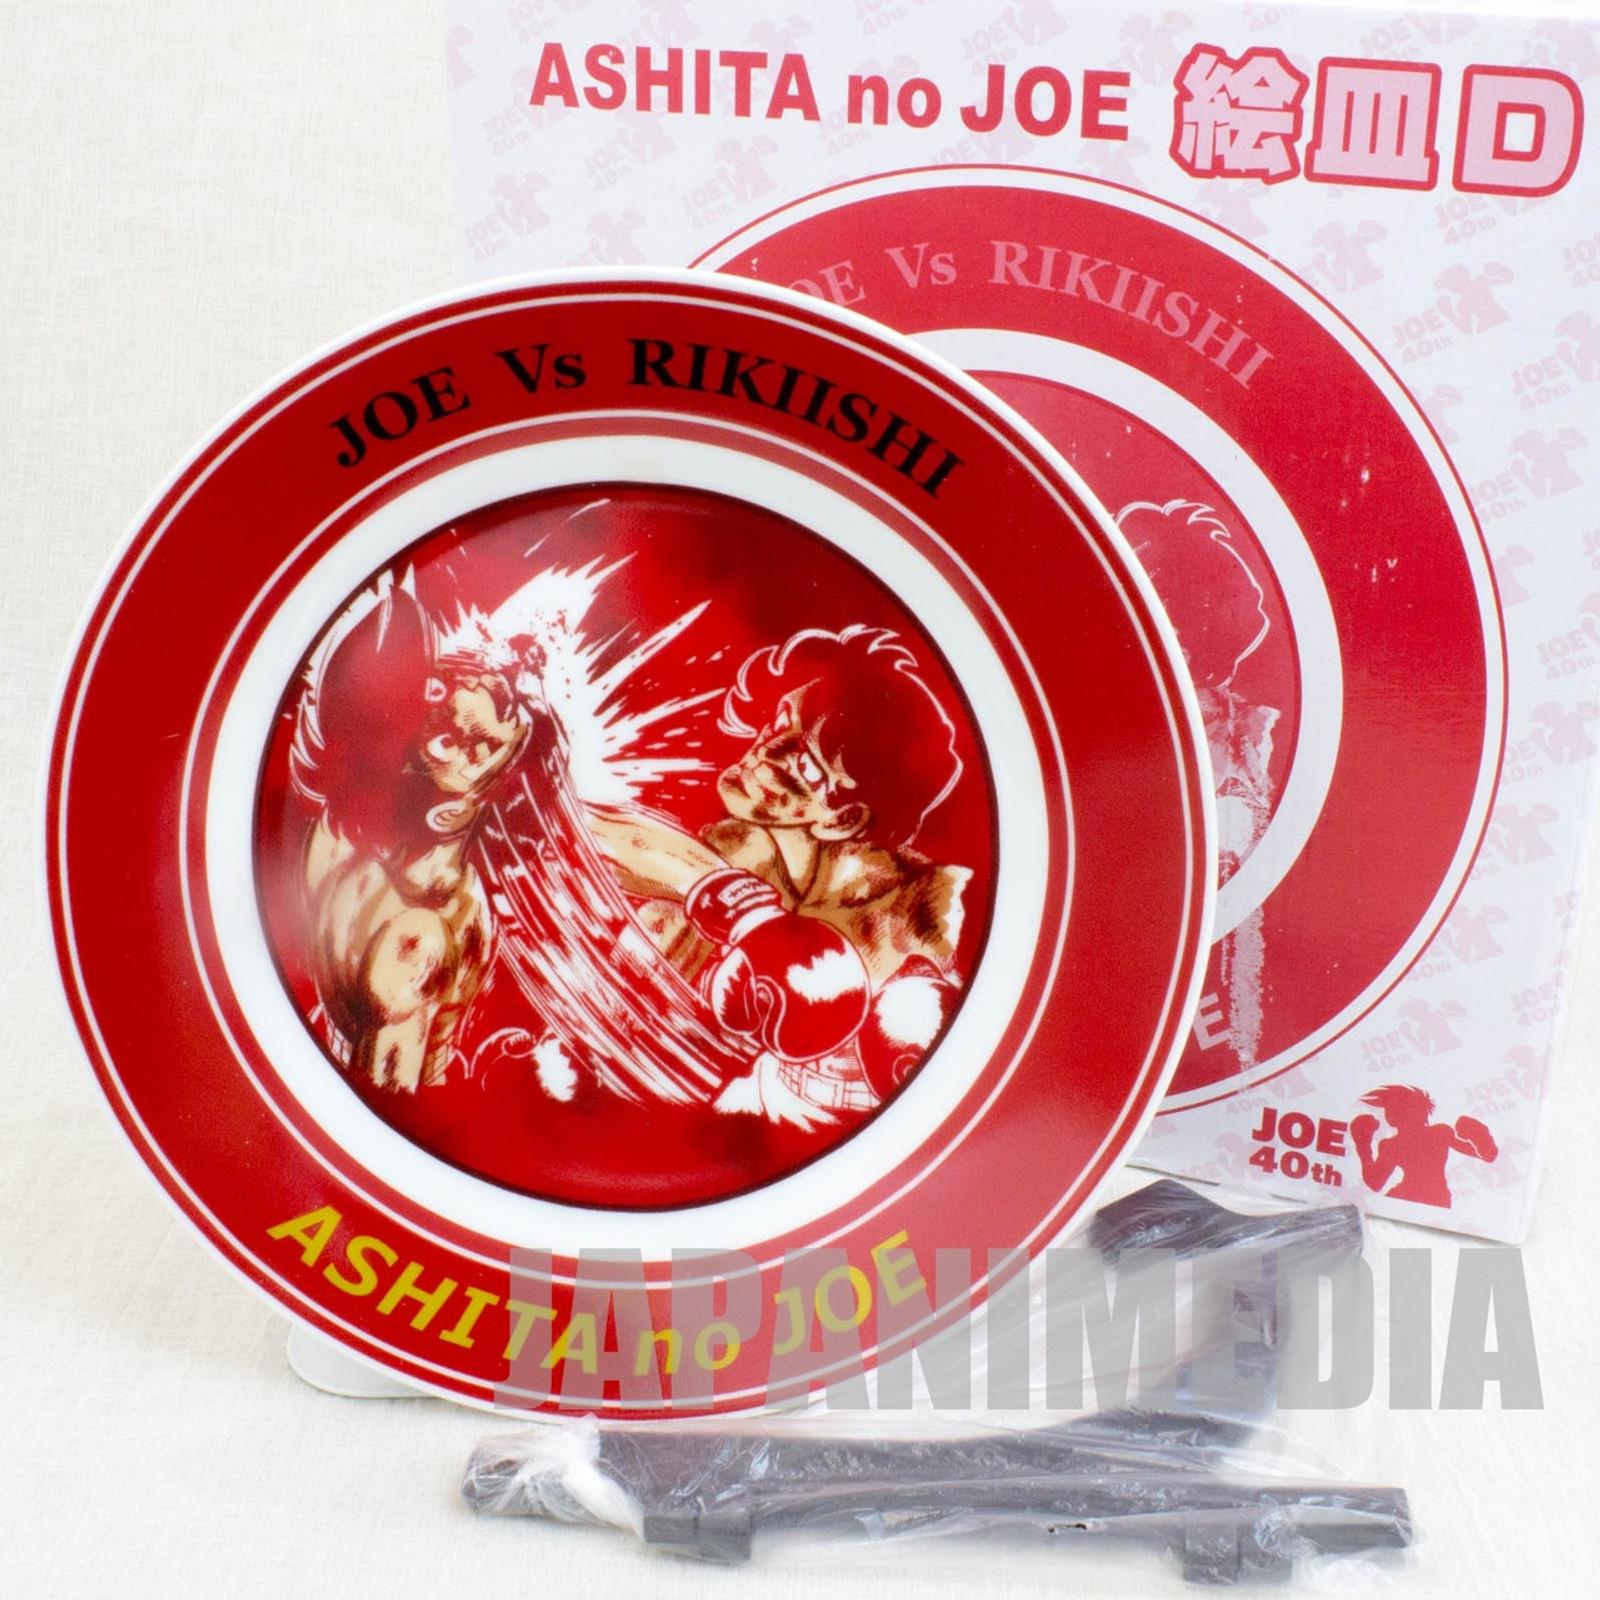 Ashita no Joe JOE vs RIKIISHI Picture Plate Dish JOE 40th Anniversary JAPAN ANIME MANGA